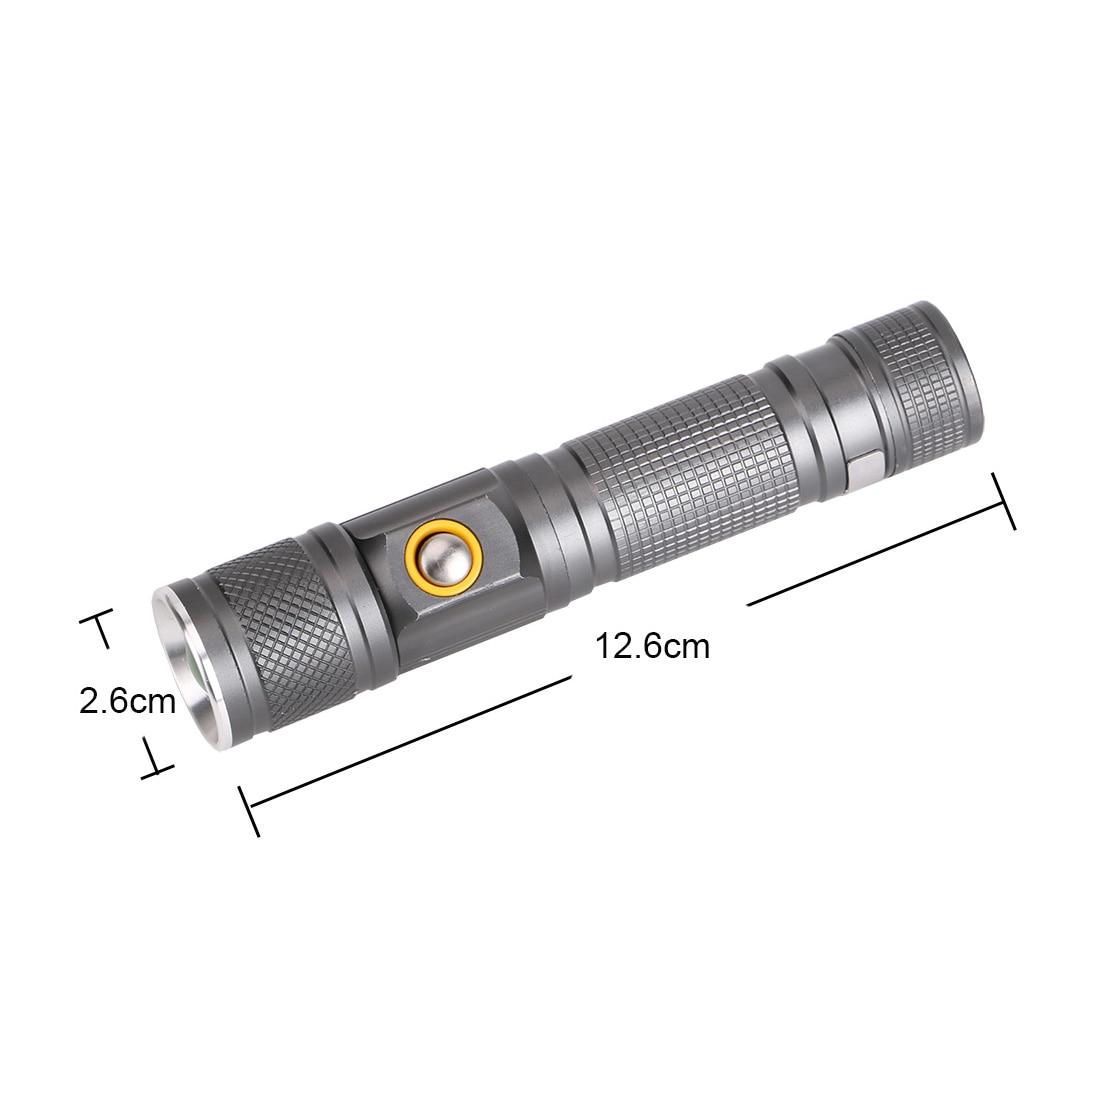 Rechargeable Waterproof Flash Light 1pcs Portable Light Flashlight Xml-T6 Led Torch